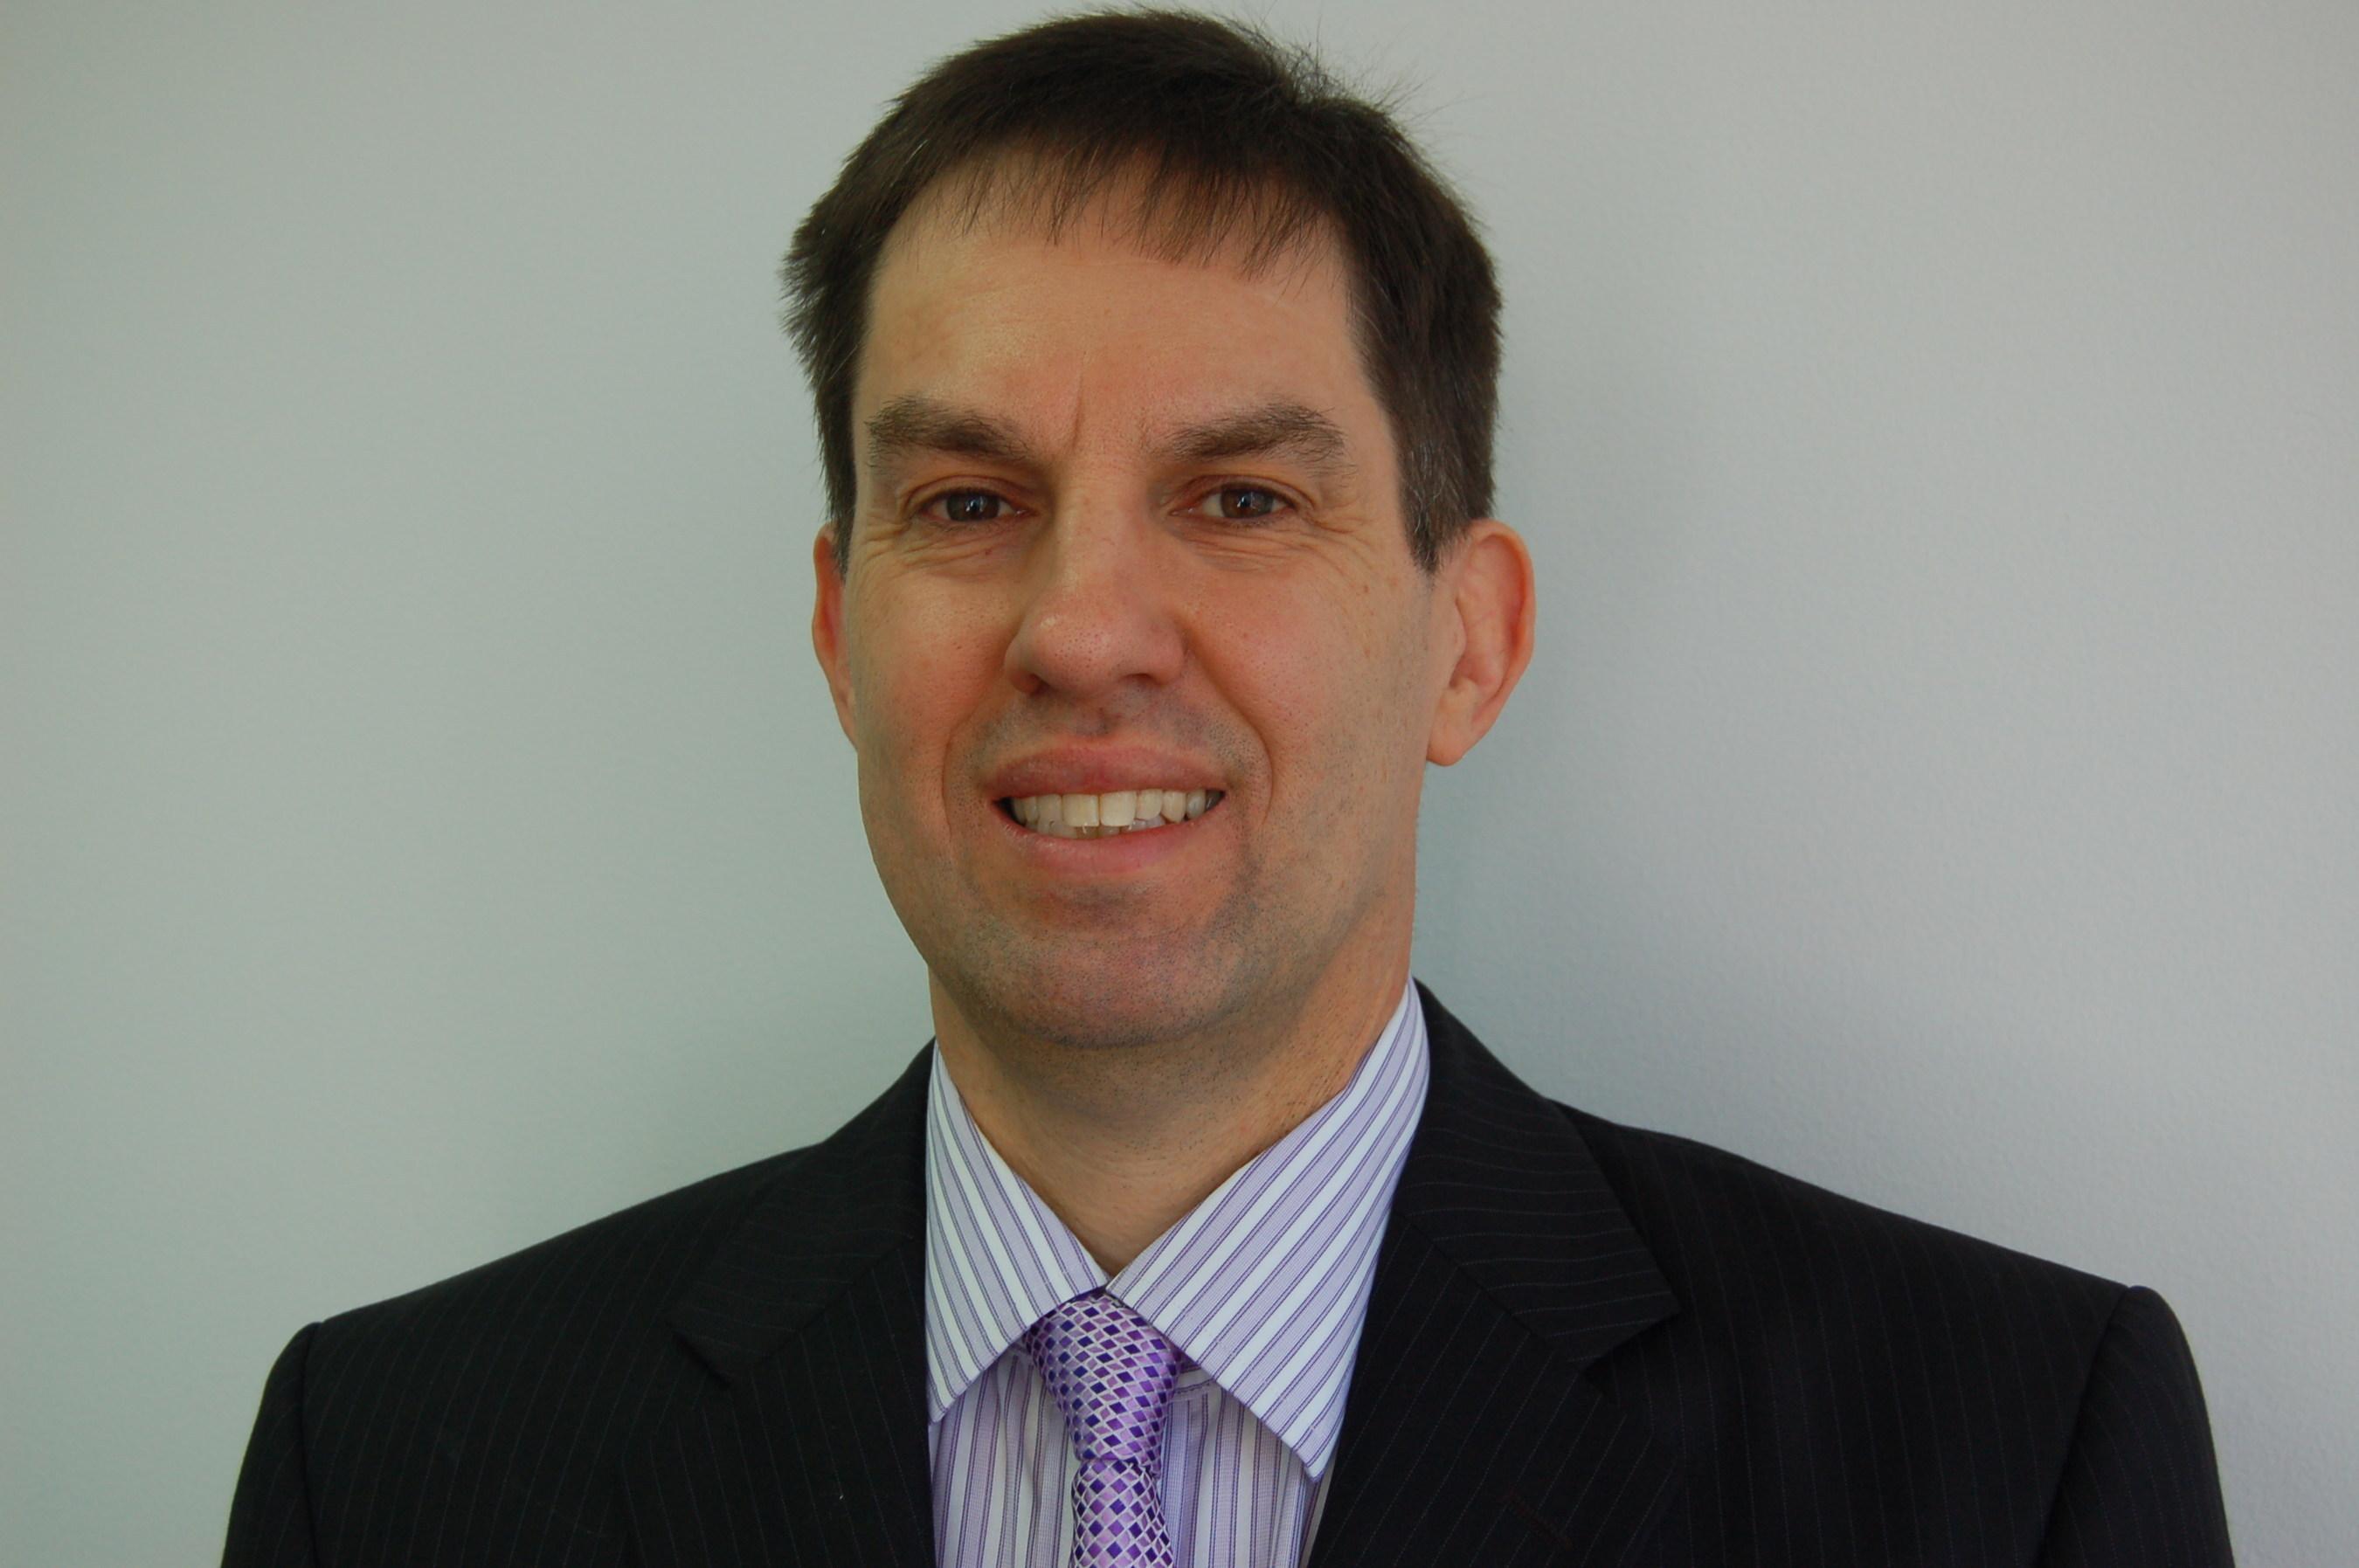 Phil Harpur, Senior Research Manager, Australia & New Zealand ICT Practice (PRNewsFoto/Frost & Sullivan)